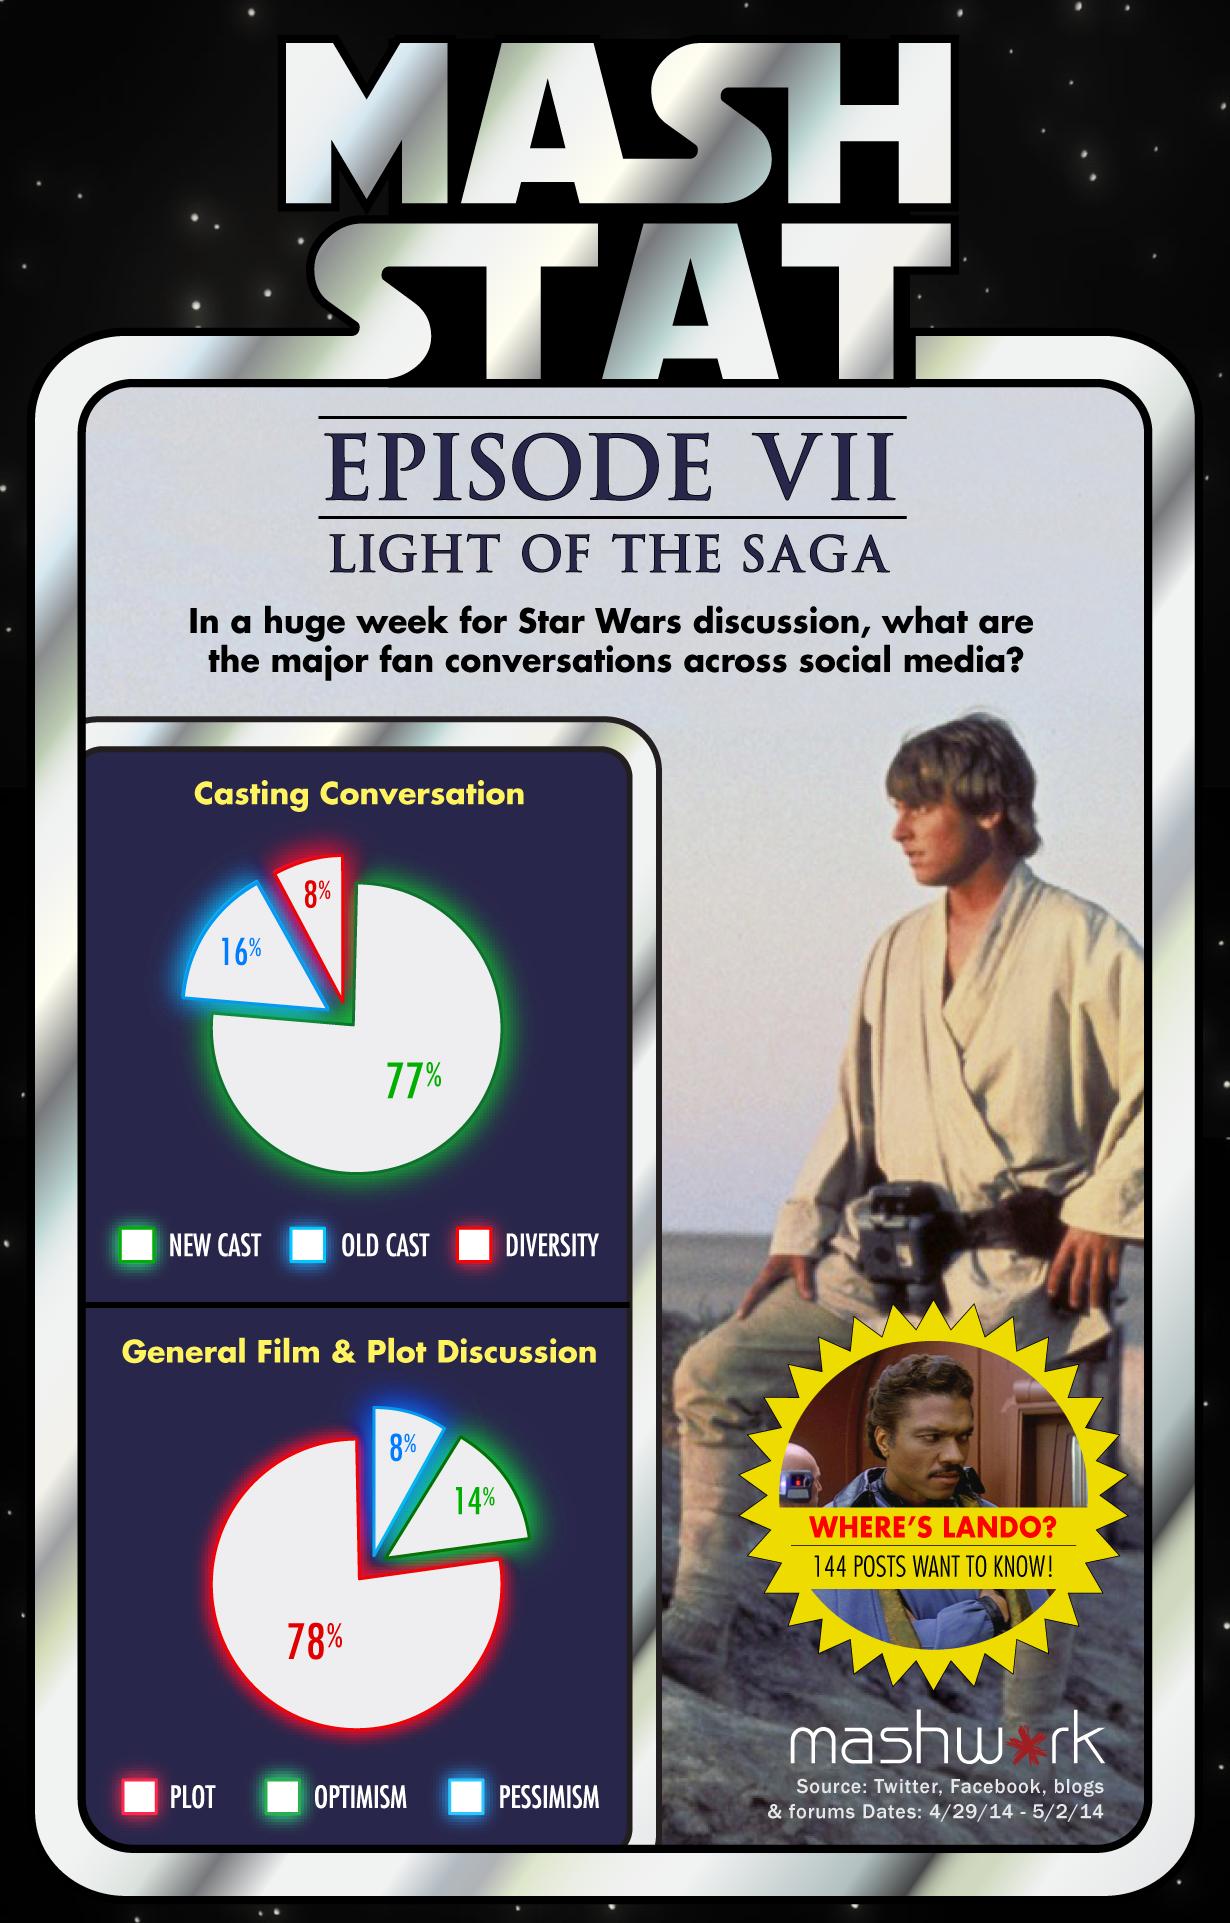 Star Wars Episode VII: Light of the Saga